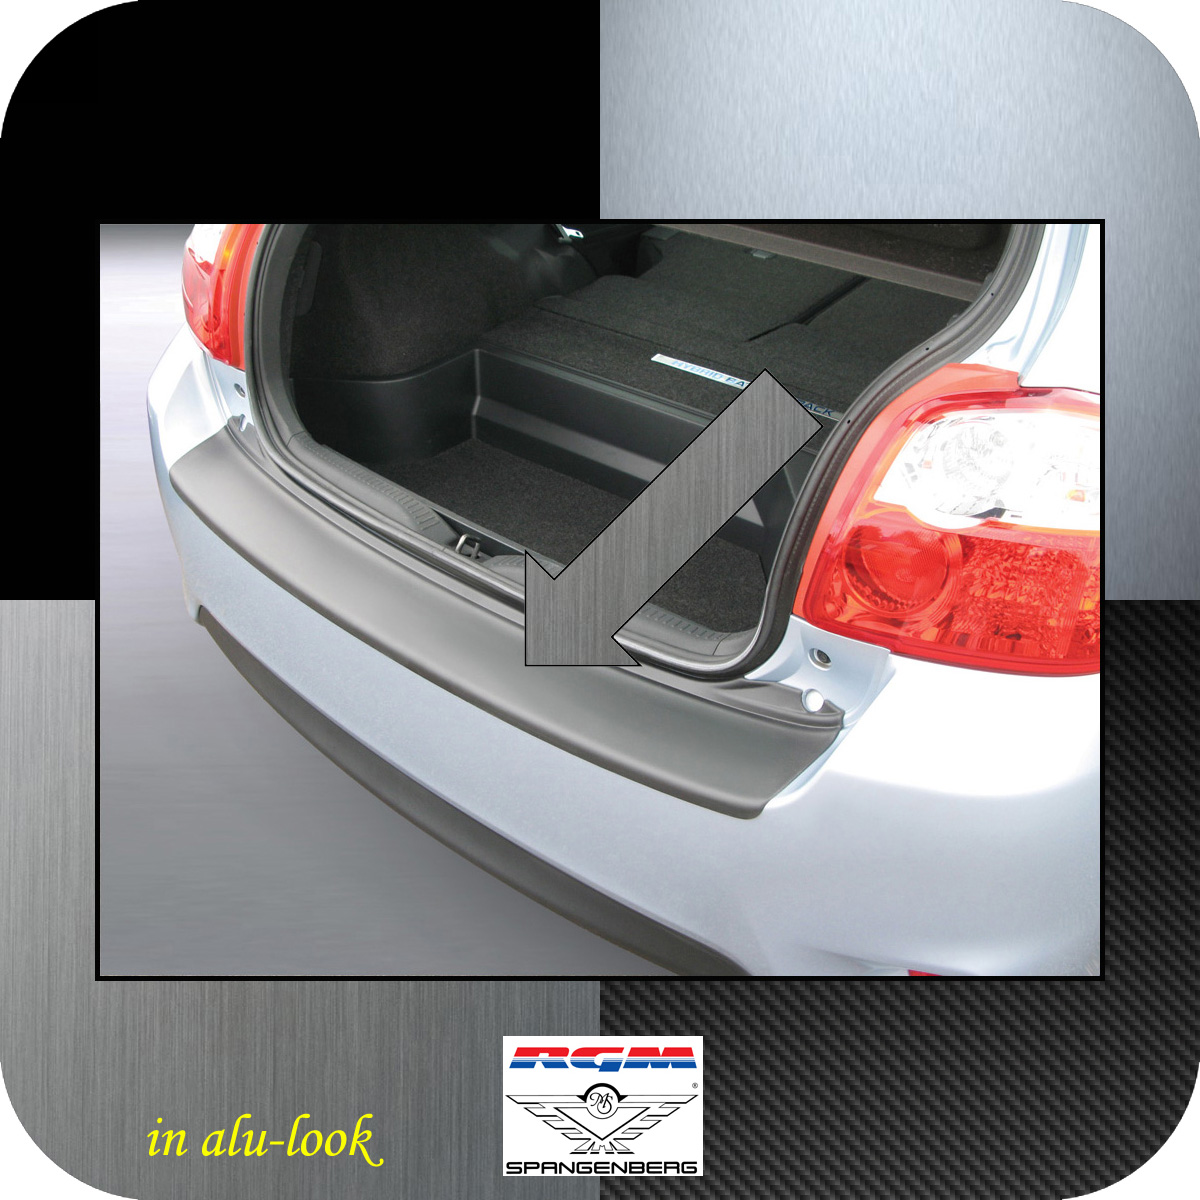 Ladekantenschutz Alu-Look Toyota Auris I Schrägheck ab Mopf 2010-2012 3504515